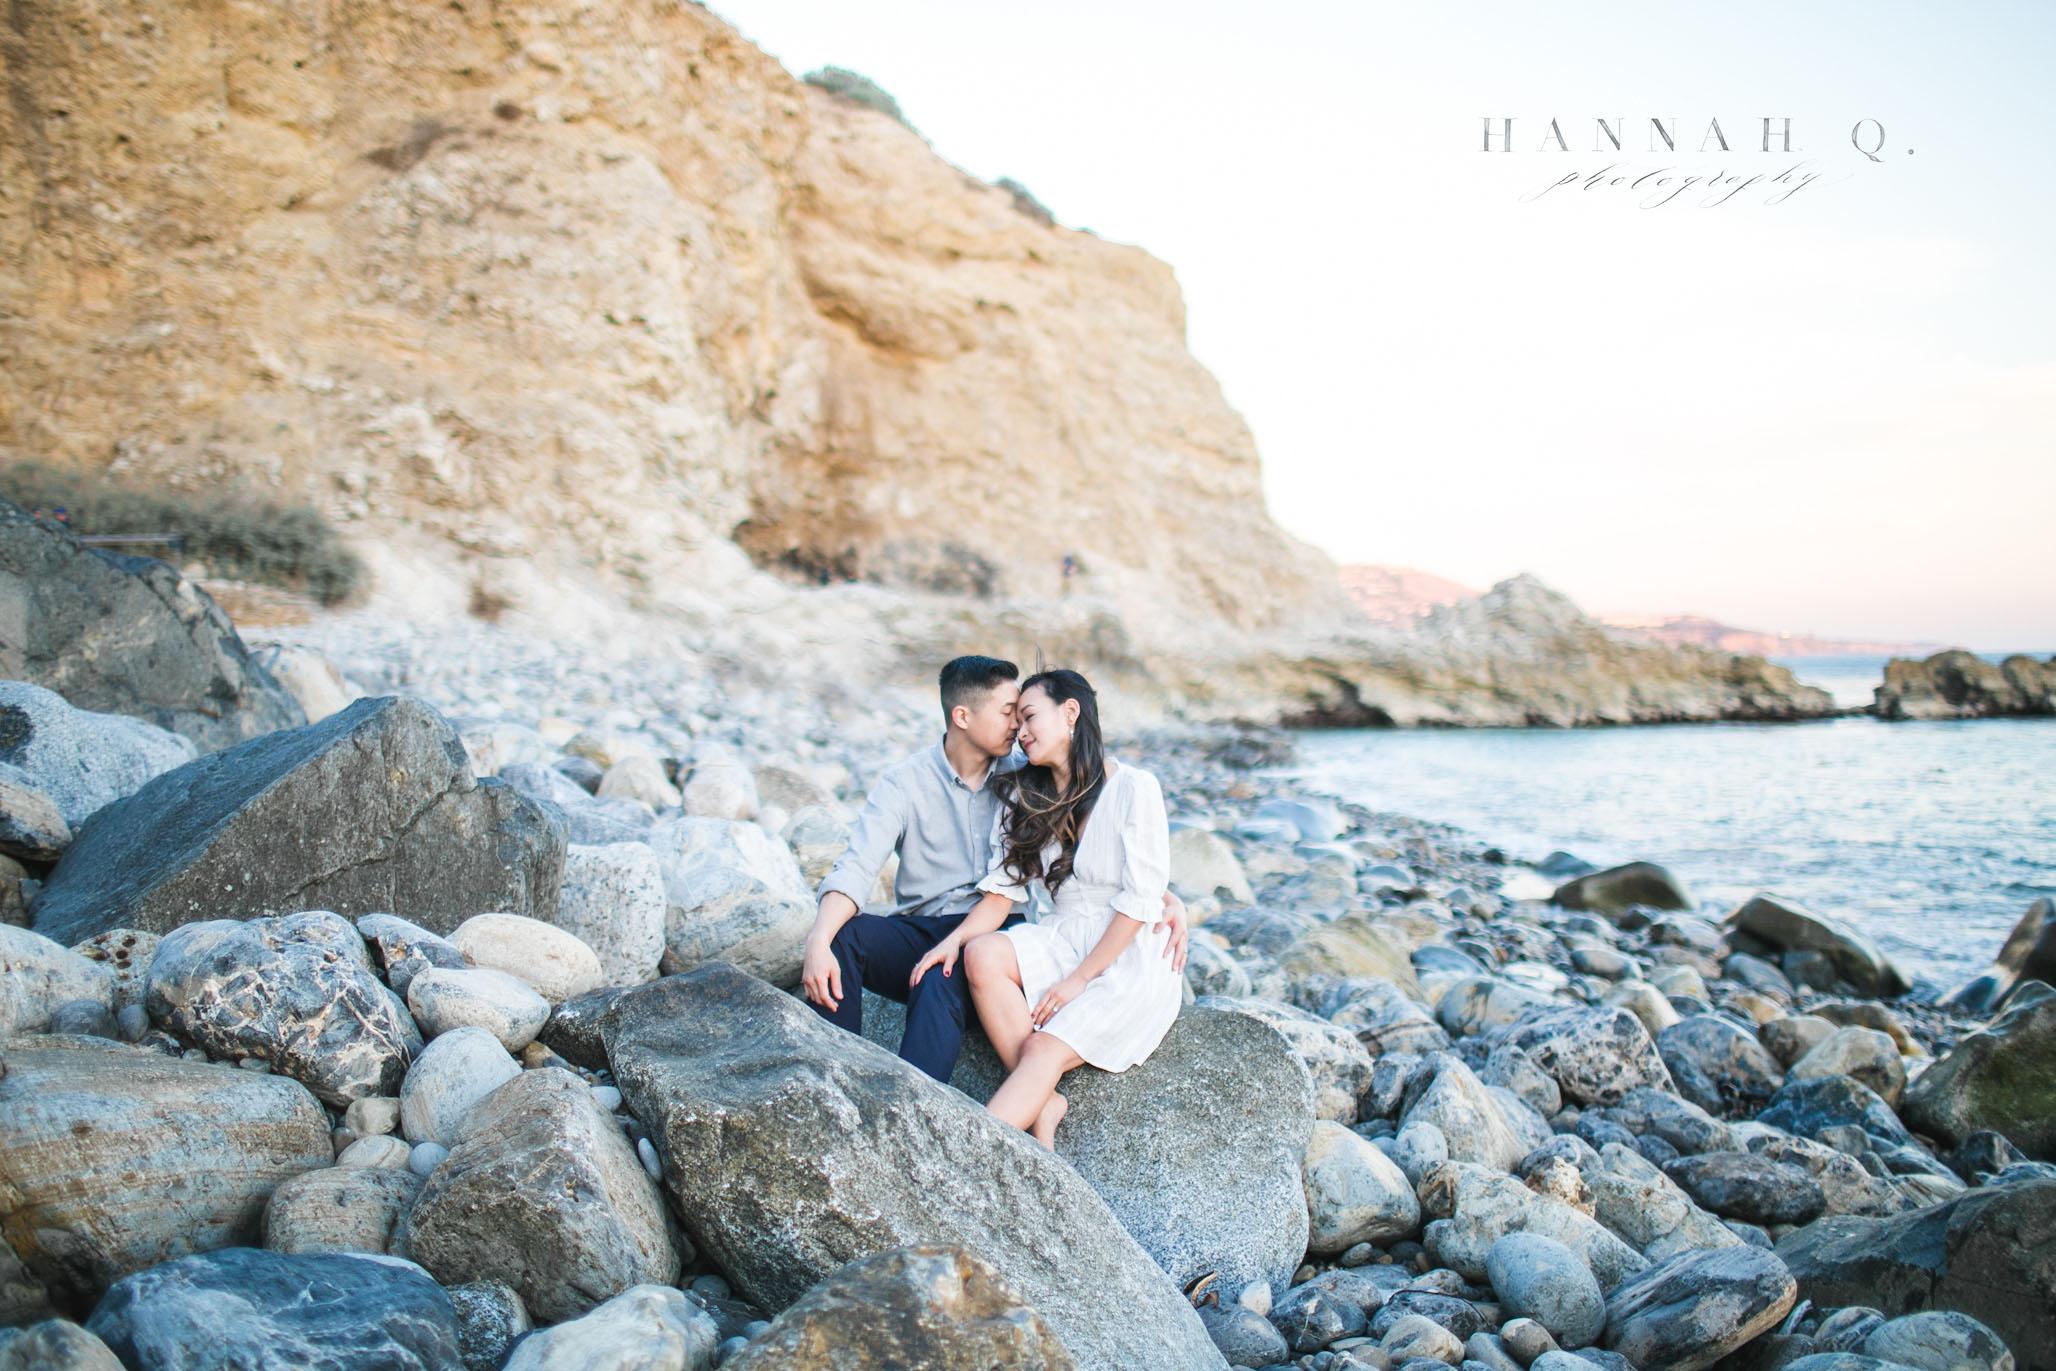 terranea cove engagement photoshoot